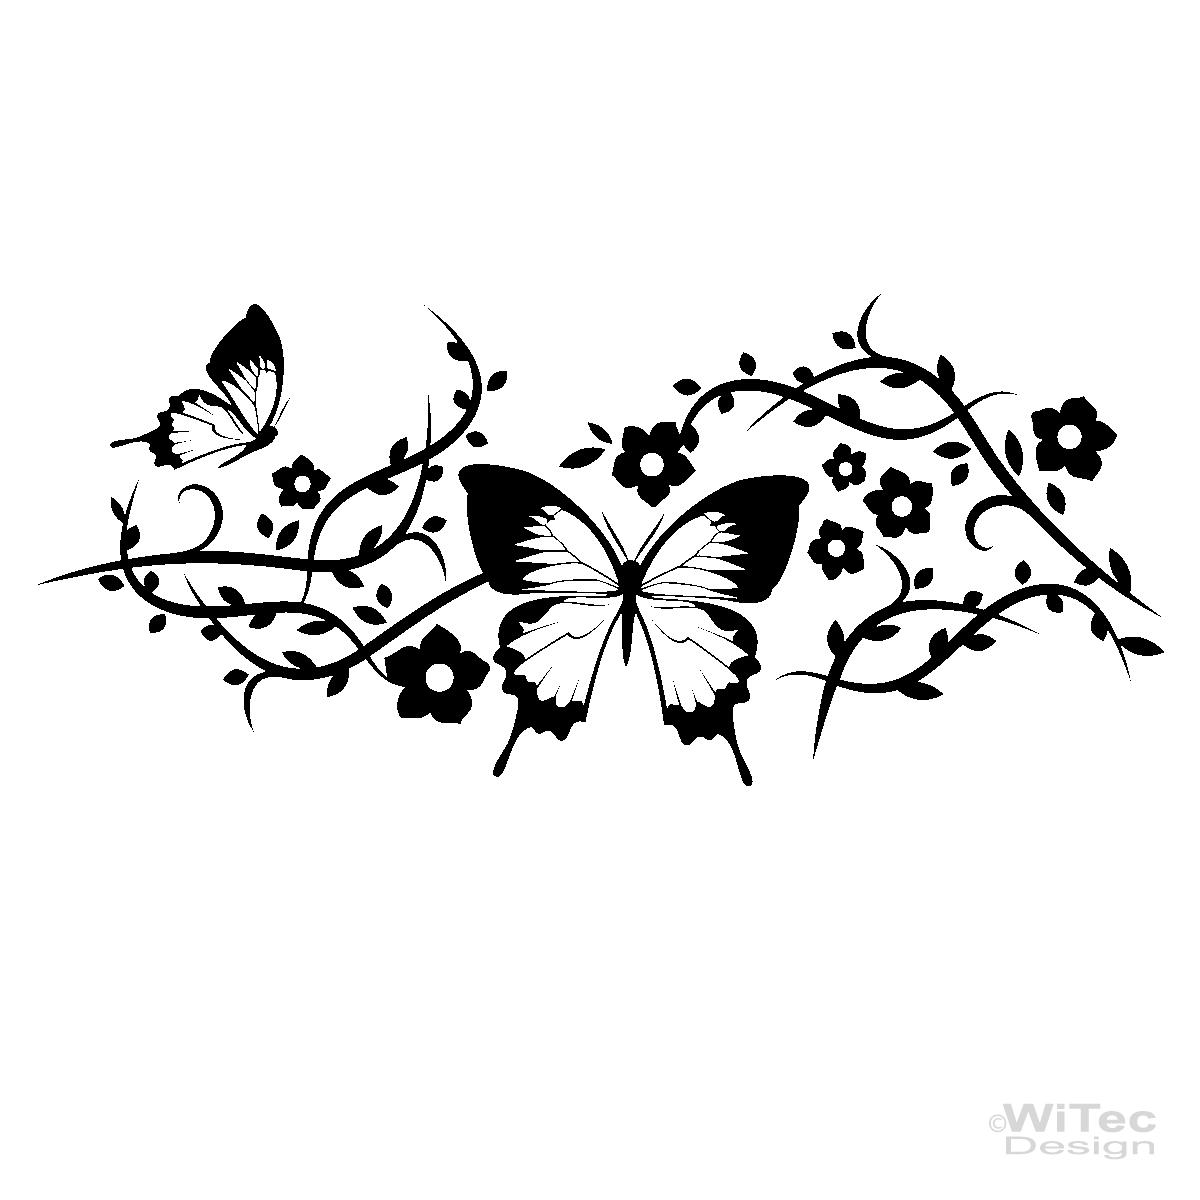 Wandtattoo Blumenranke Weiß : Wandtattoo Blumenranke Schmetterling Wandaufkleber